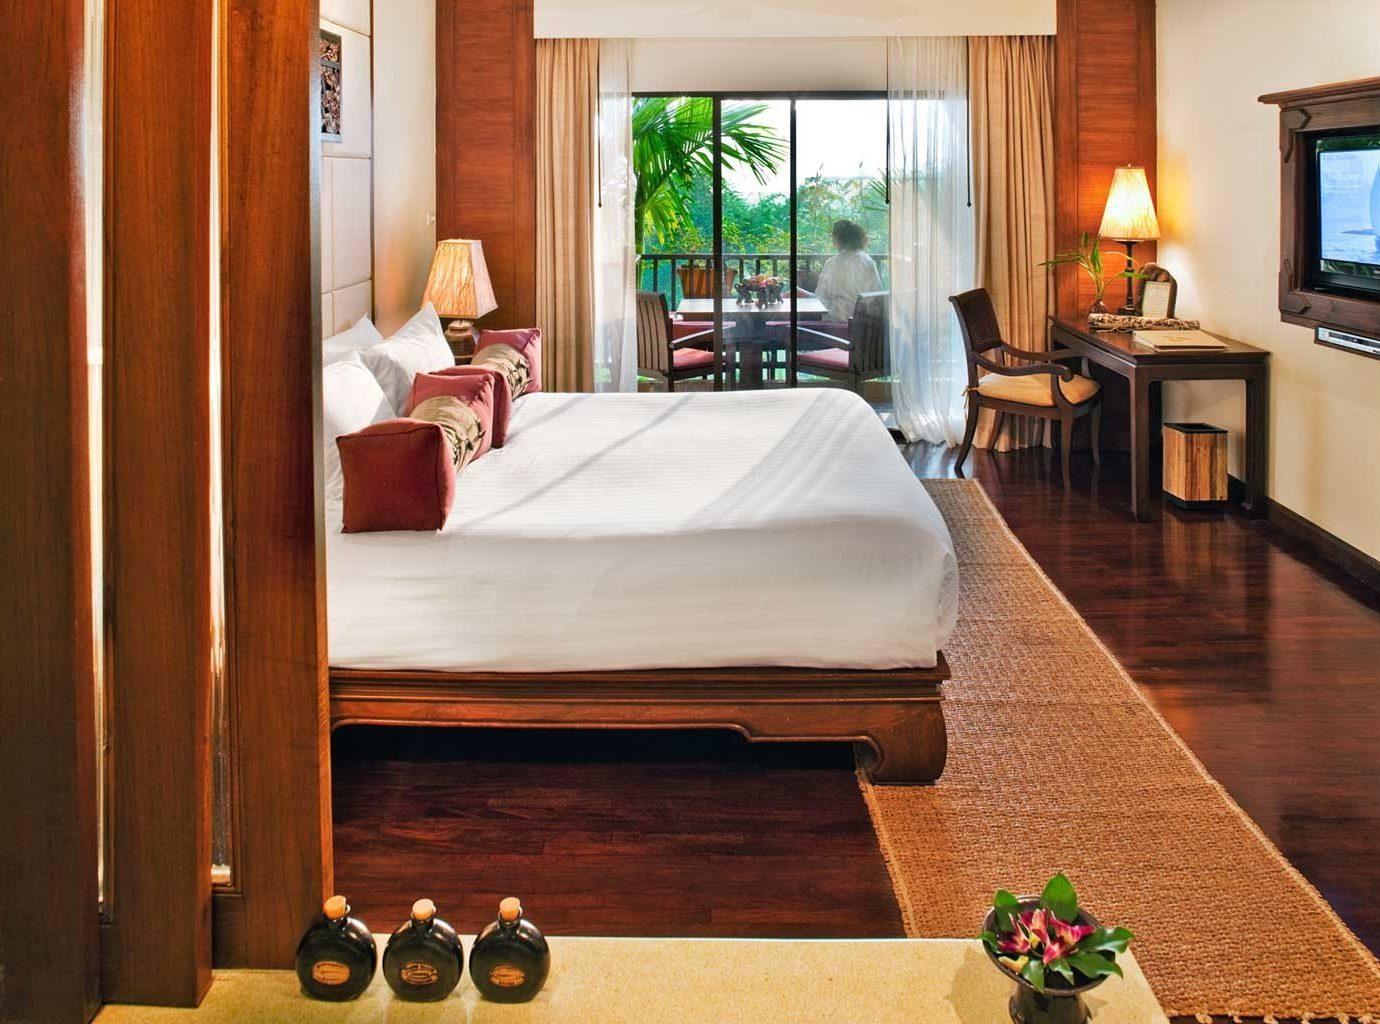 Bath Bedroom Luxury Patio Romantic Scenic views Suite property home cottage Resort Villa